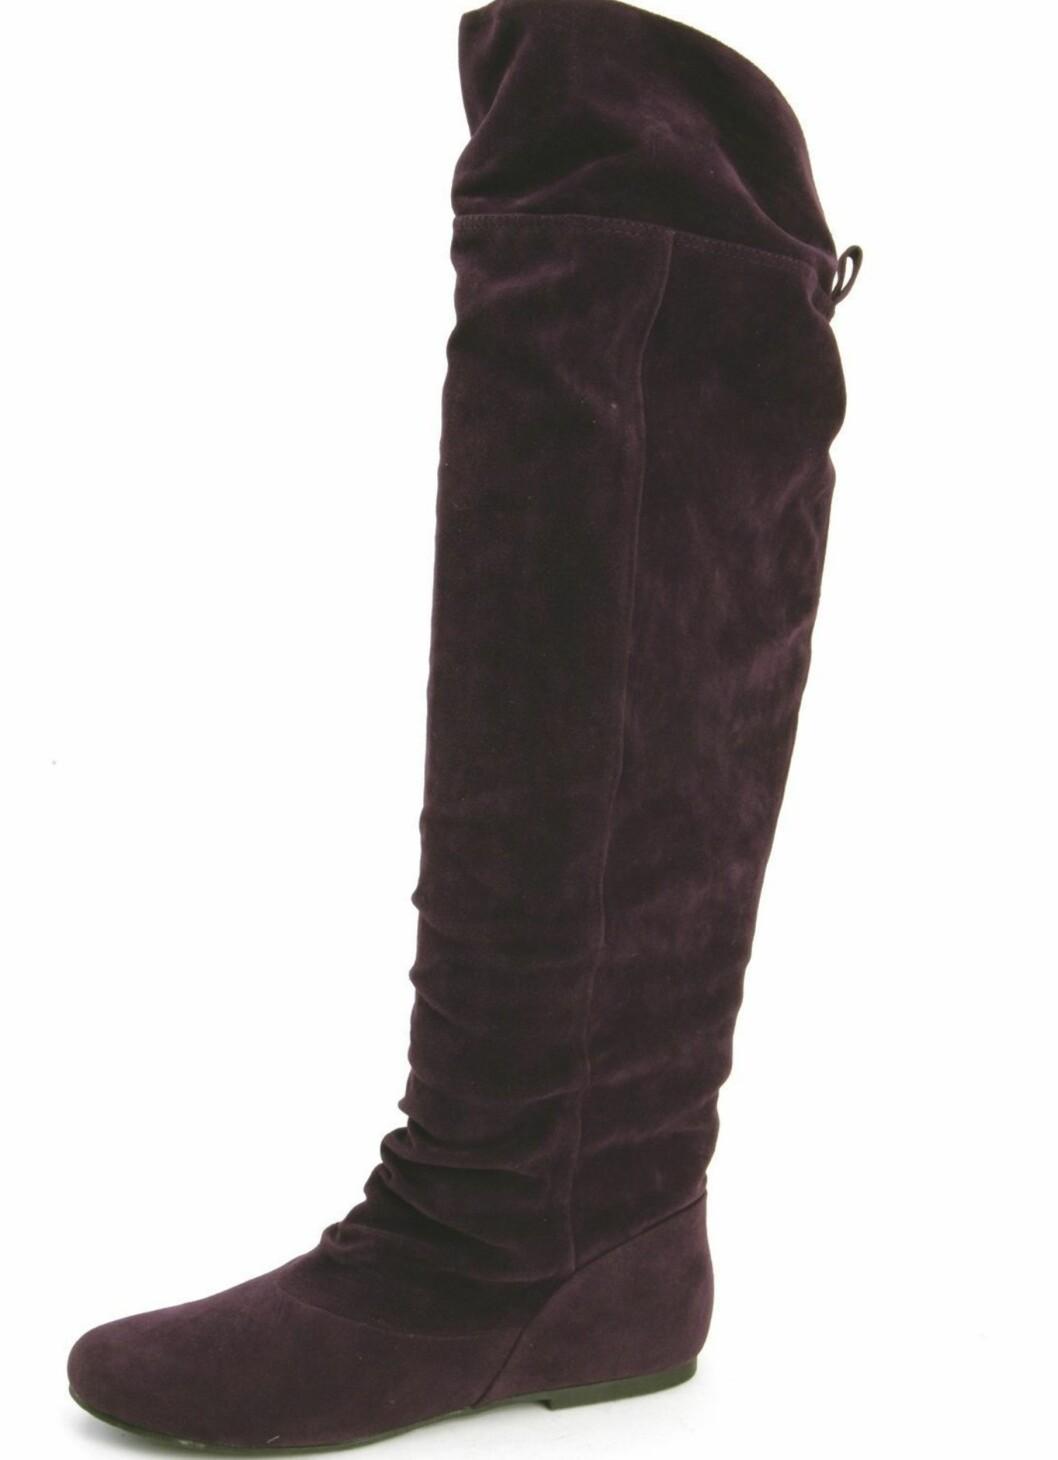 Høy lilla støvlett med knyting bak (kr 450, Ellos).